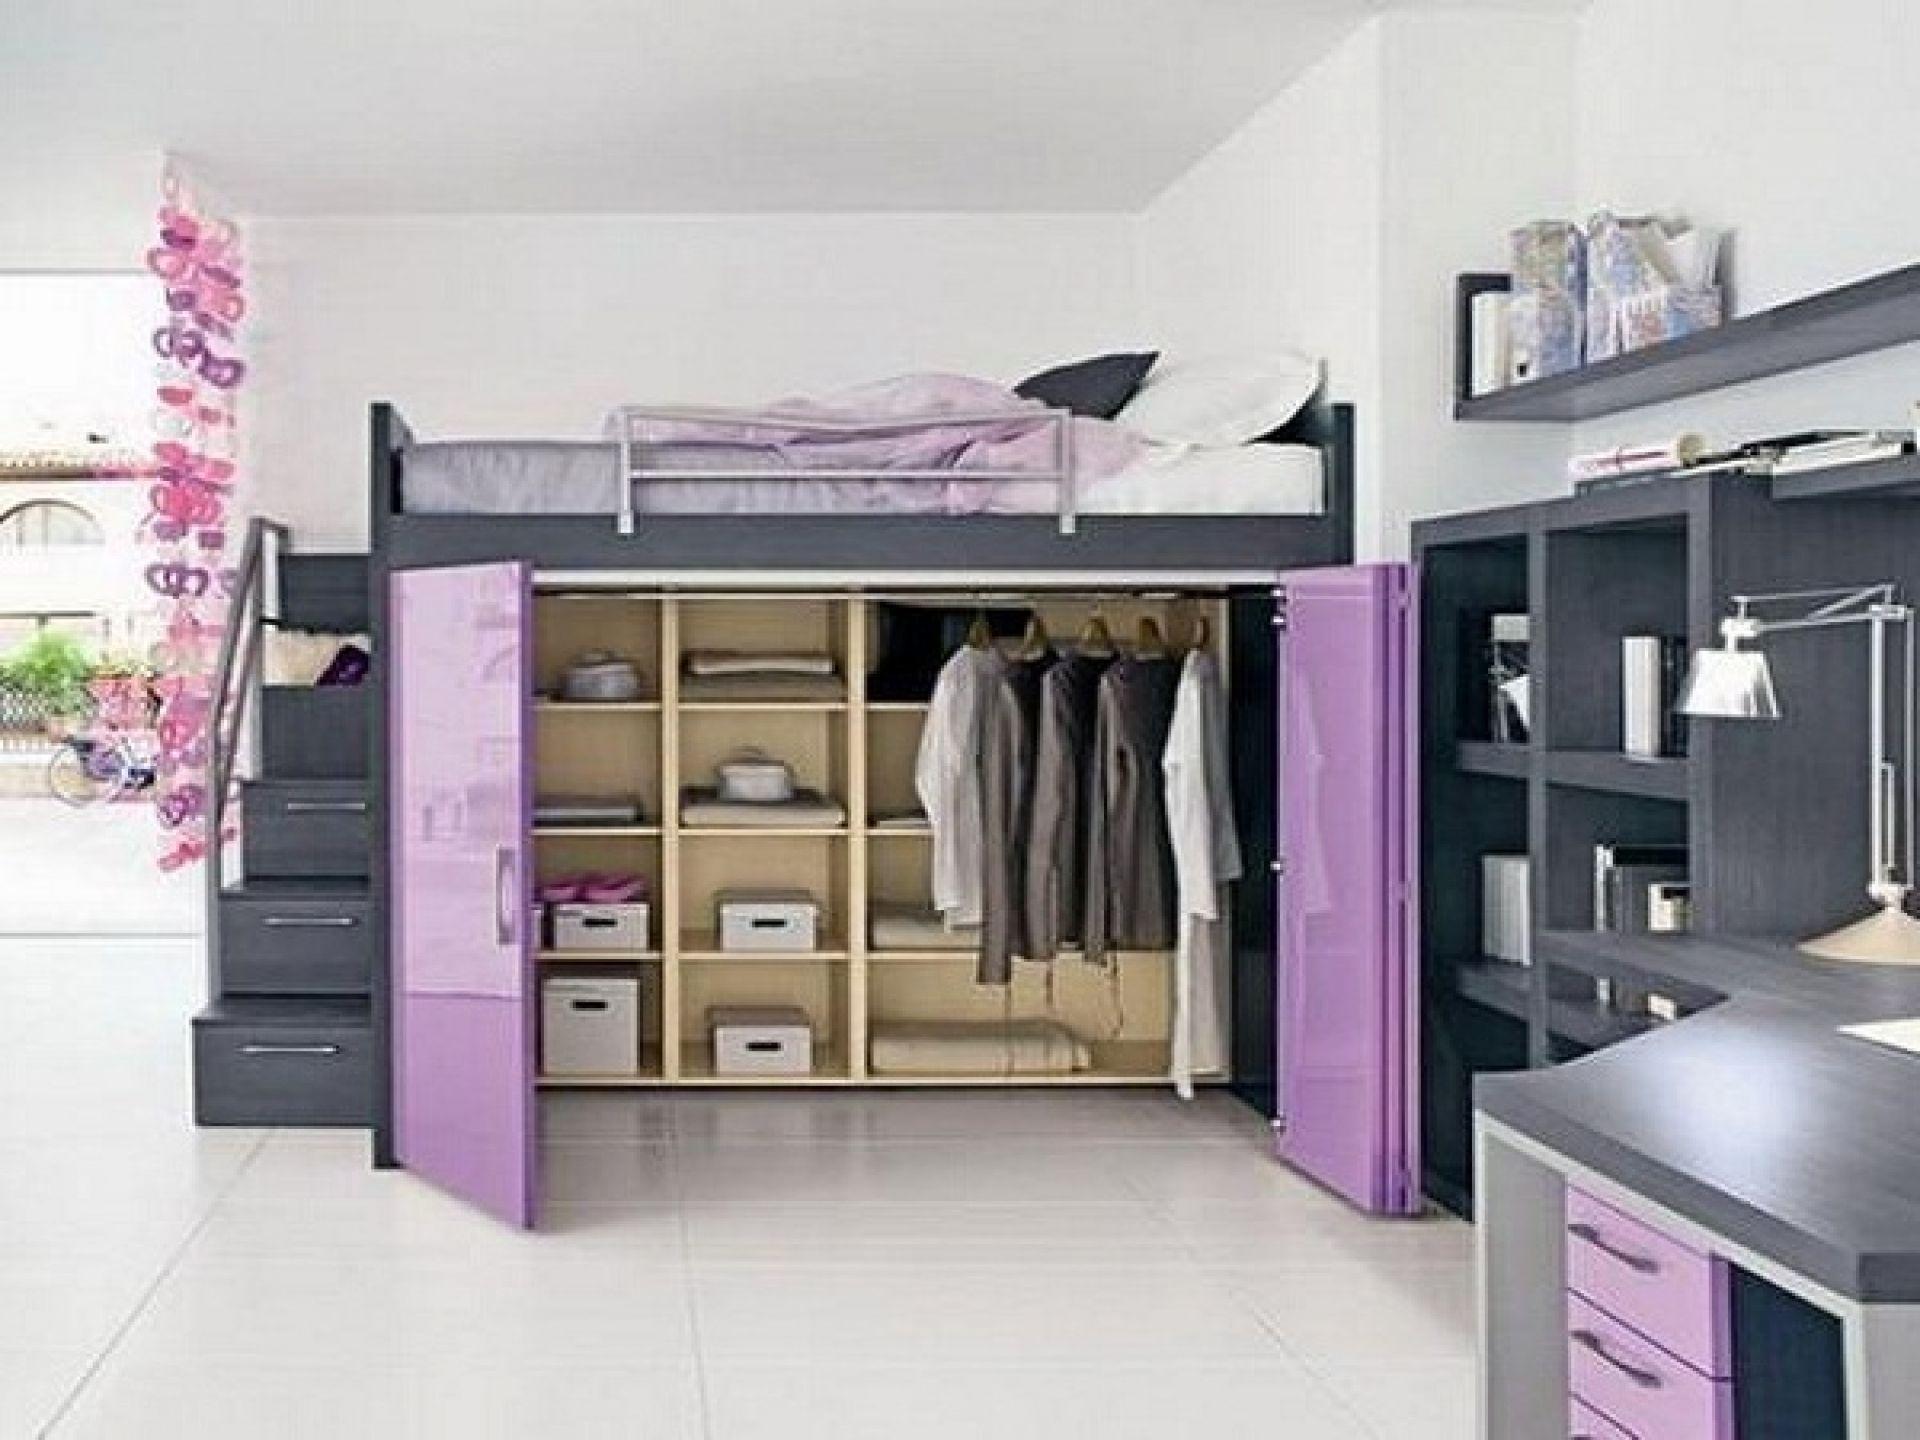 Breathtaking Bedroom Design Using Loft Beds For Adults Marvelous